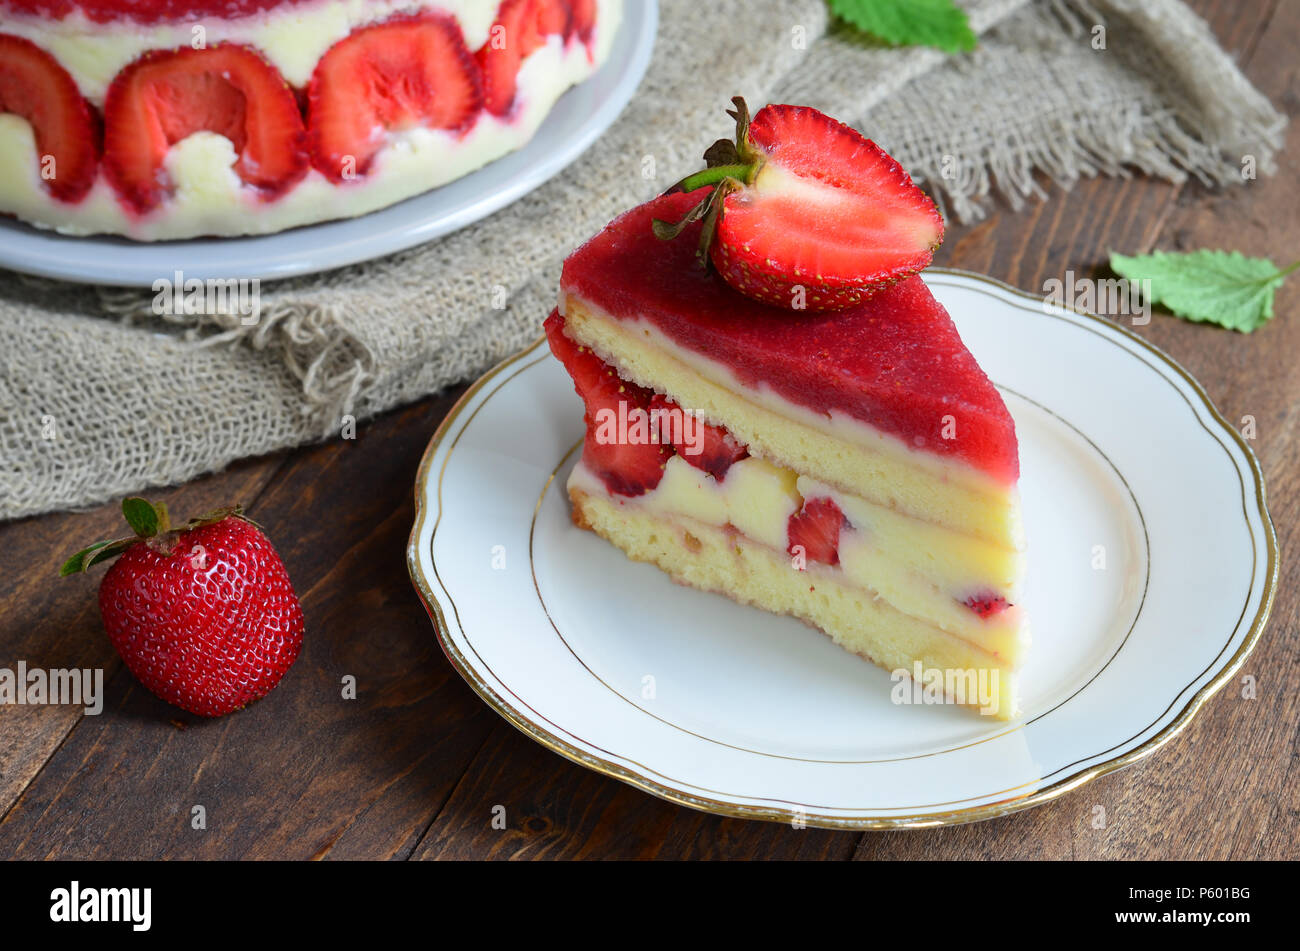 Strawberry cake, Fraisier cake on wooden background - Stock Image